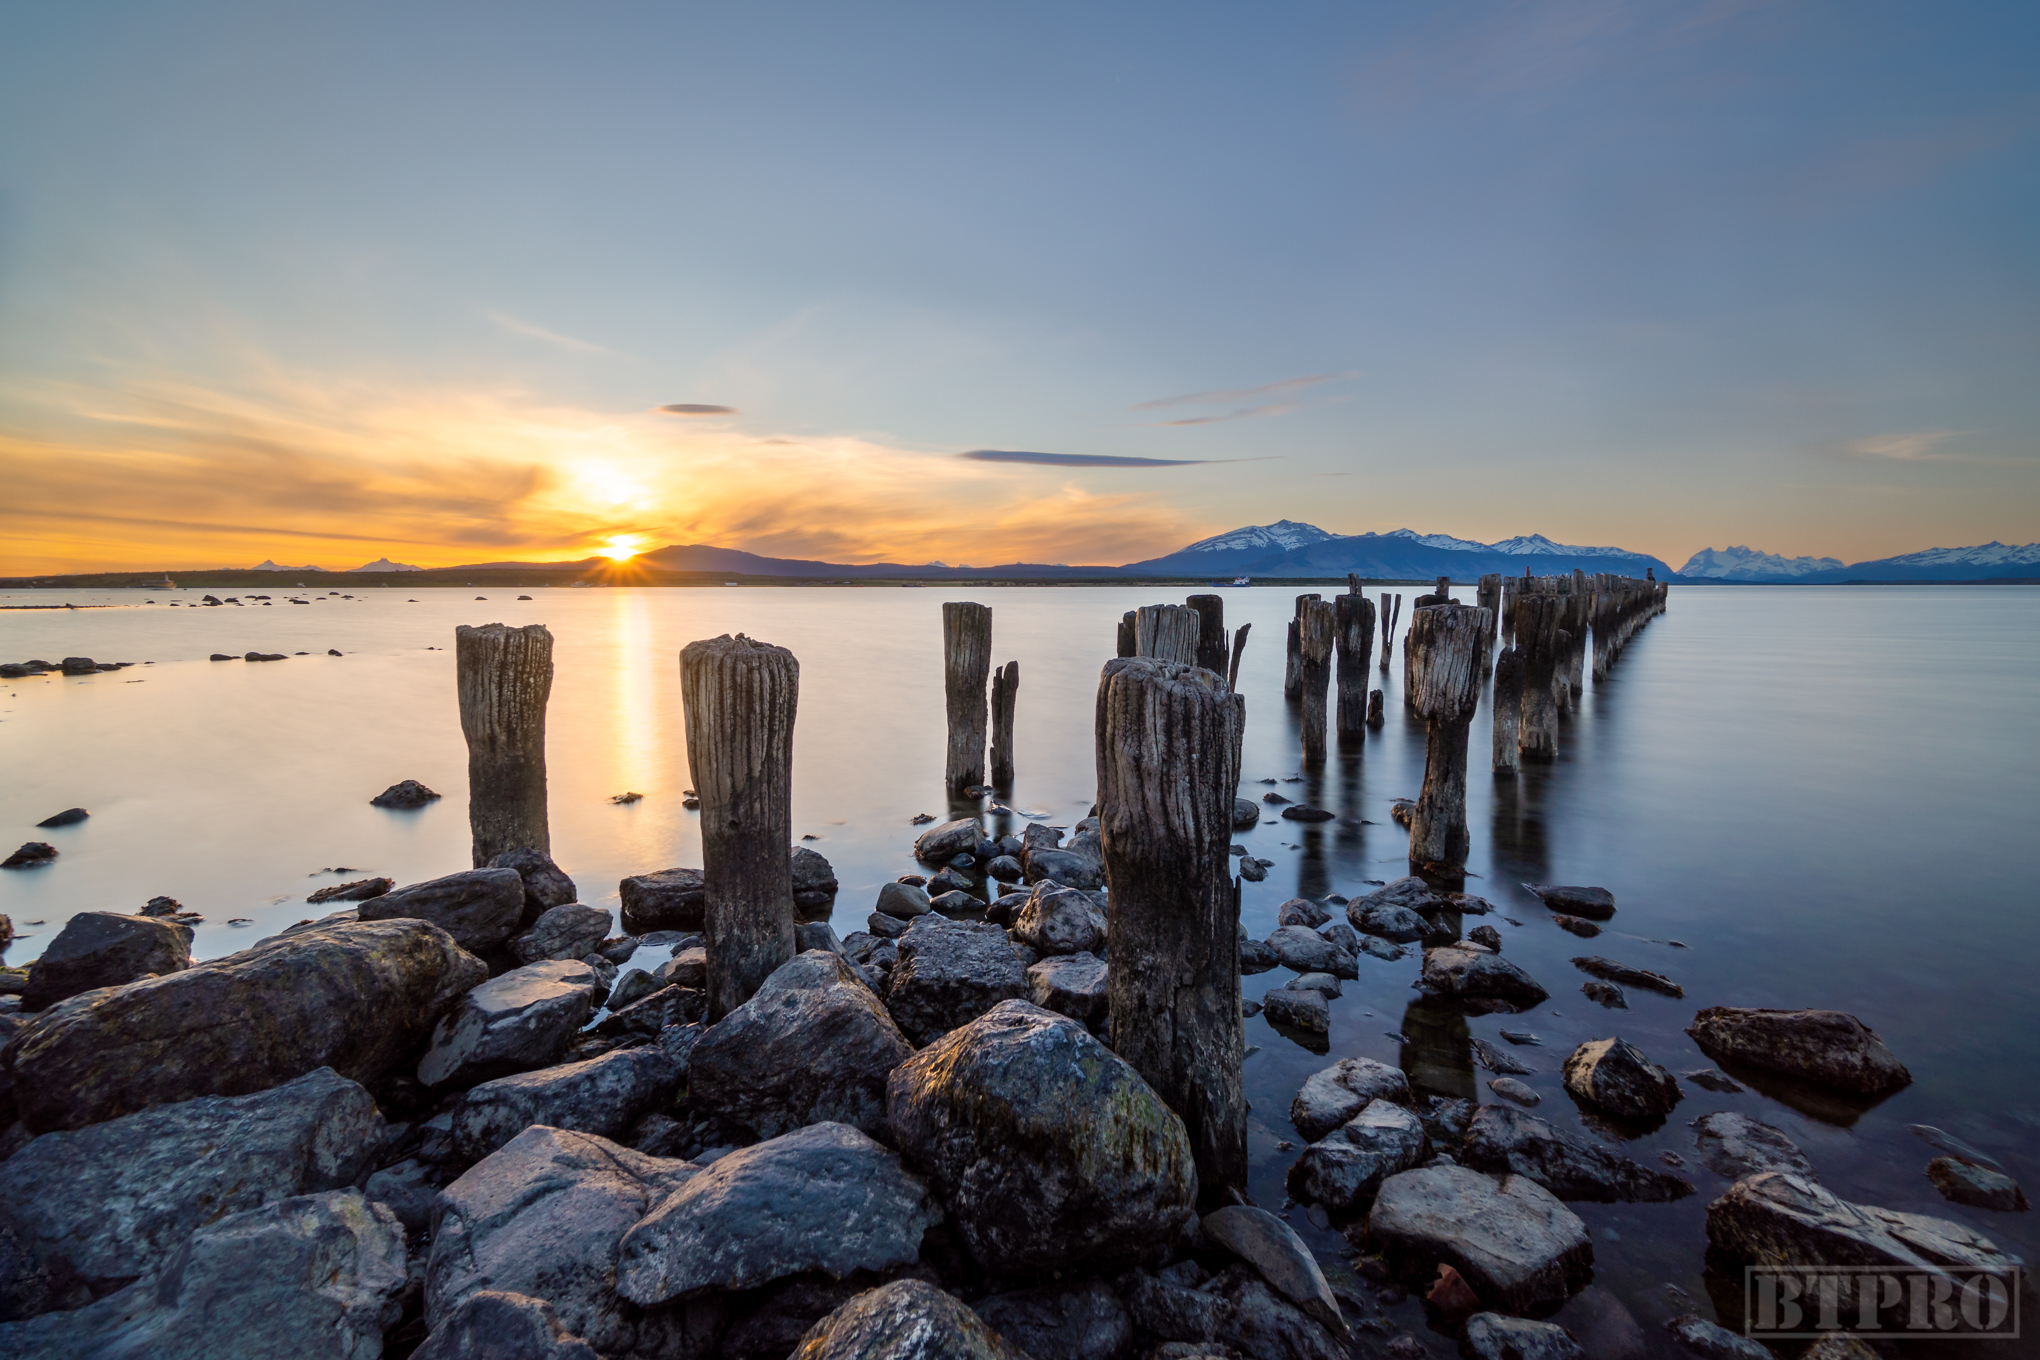 Abandoned Pier at Puerto Natales